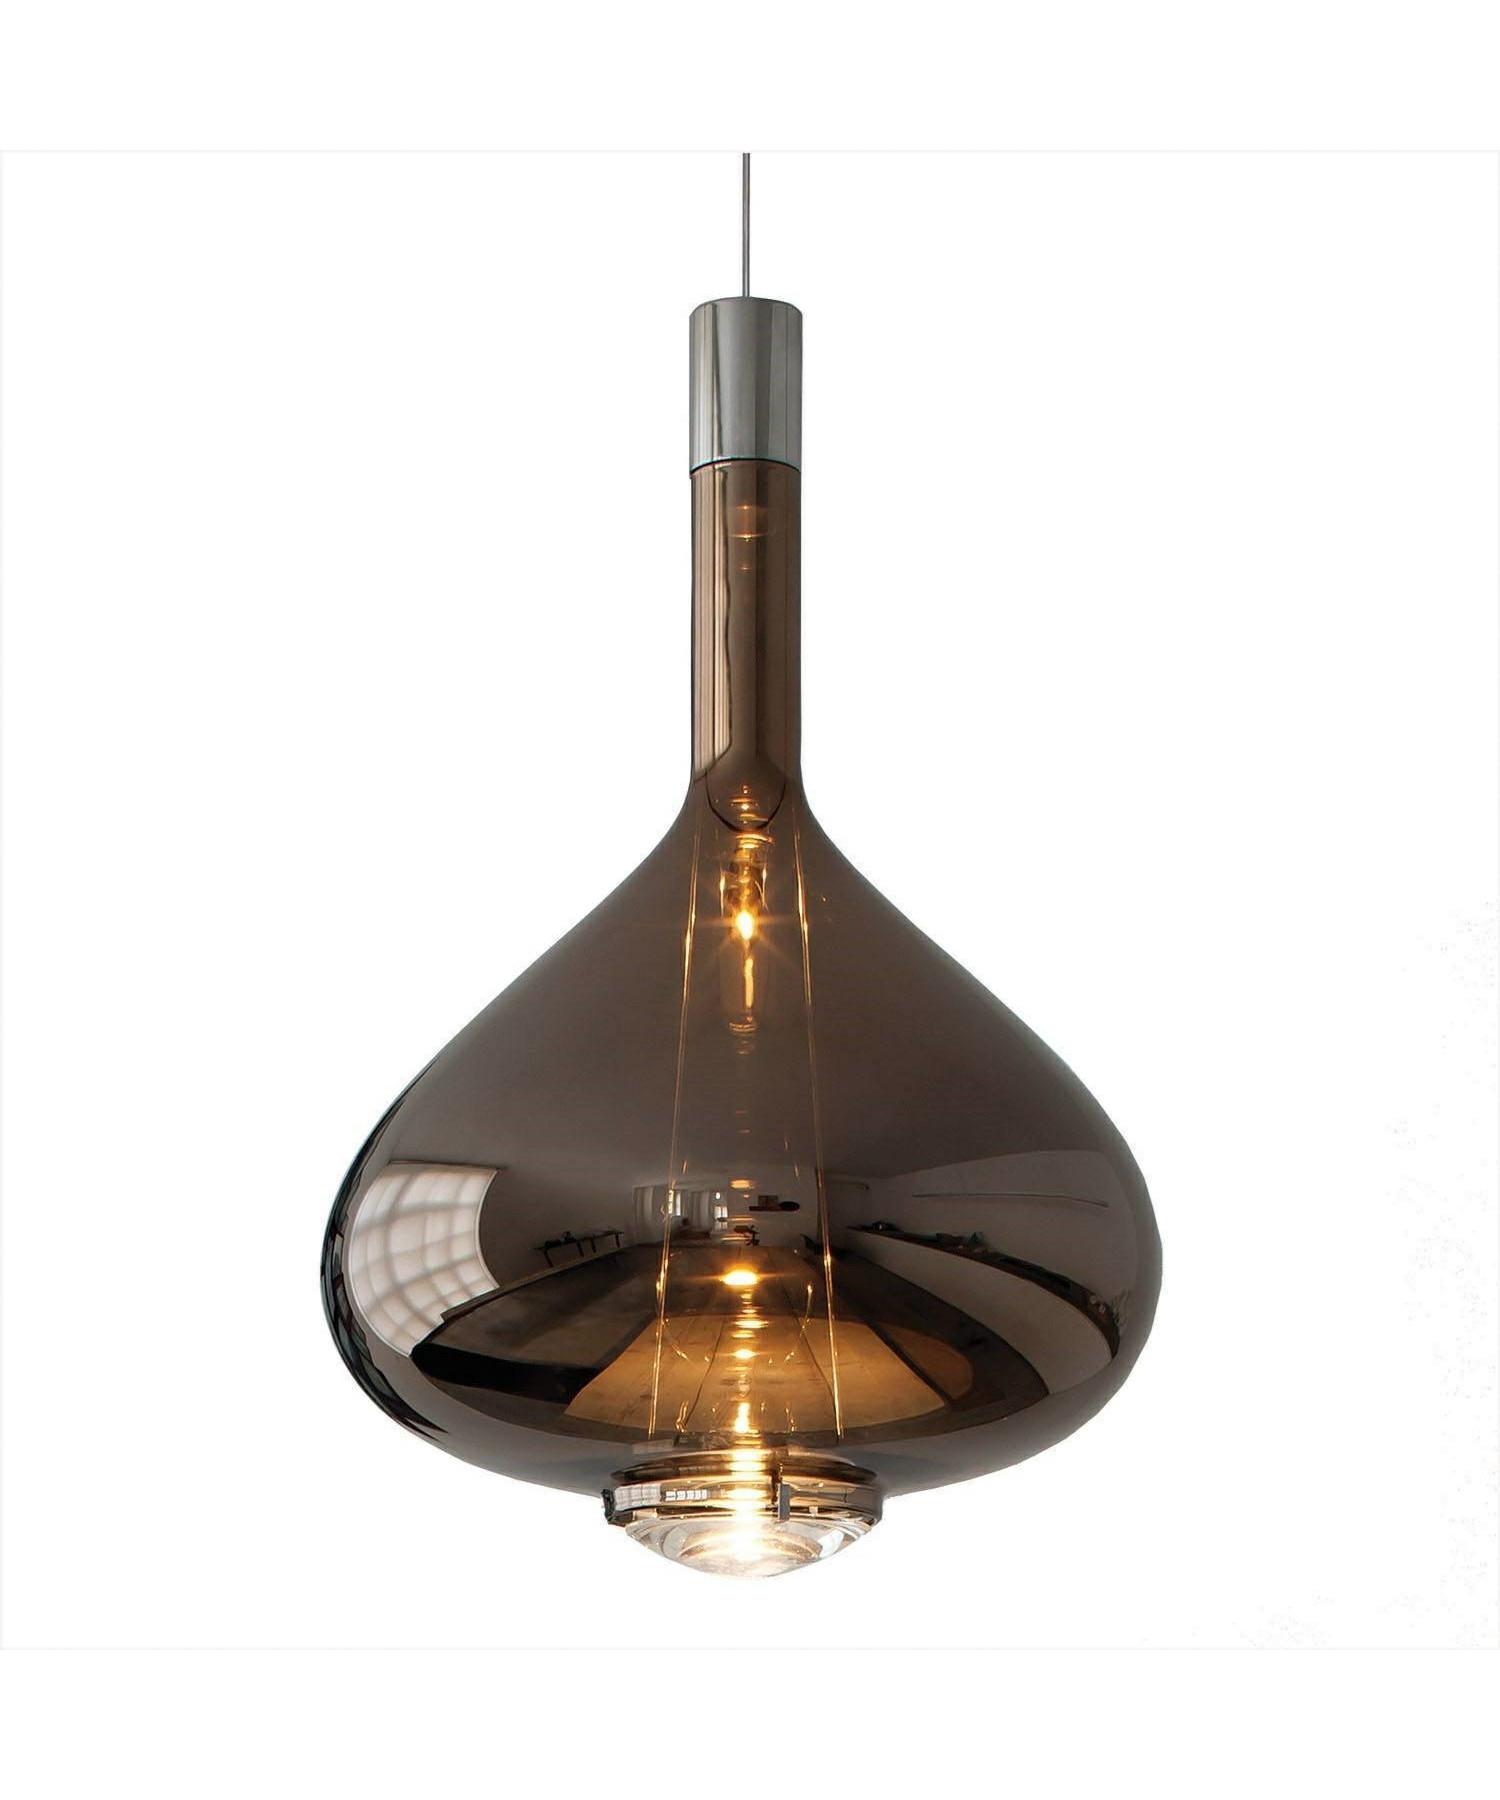 Skyfall SO Pendelleuchte Large Kupfer Glas - Studio Italia Design